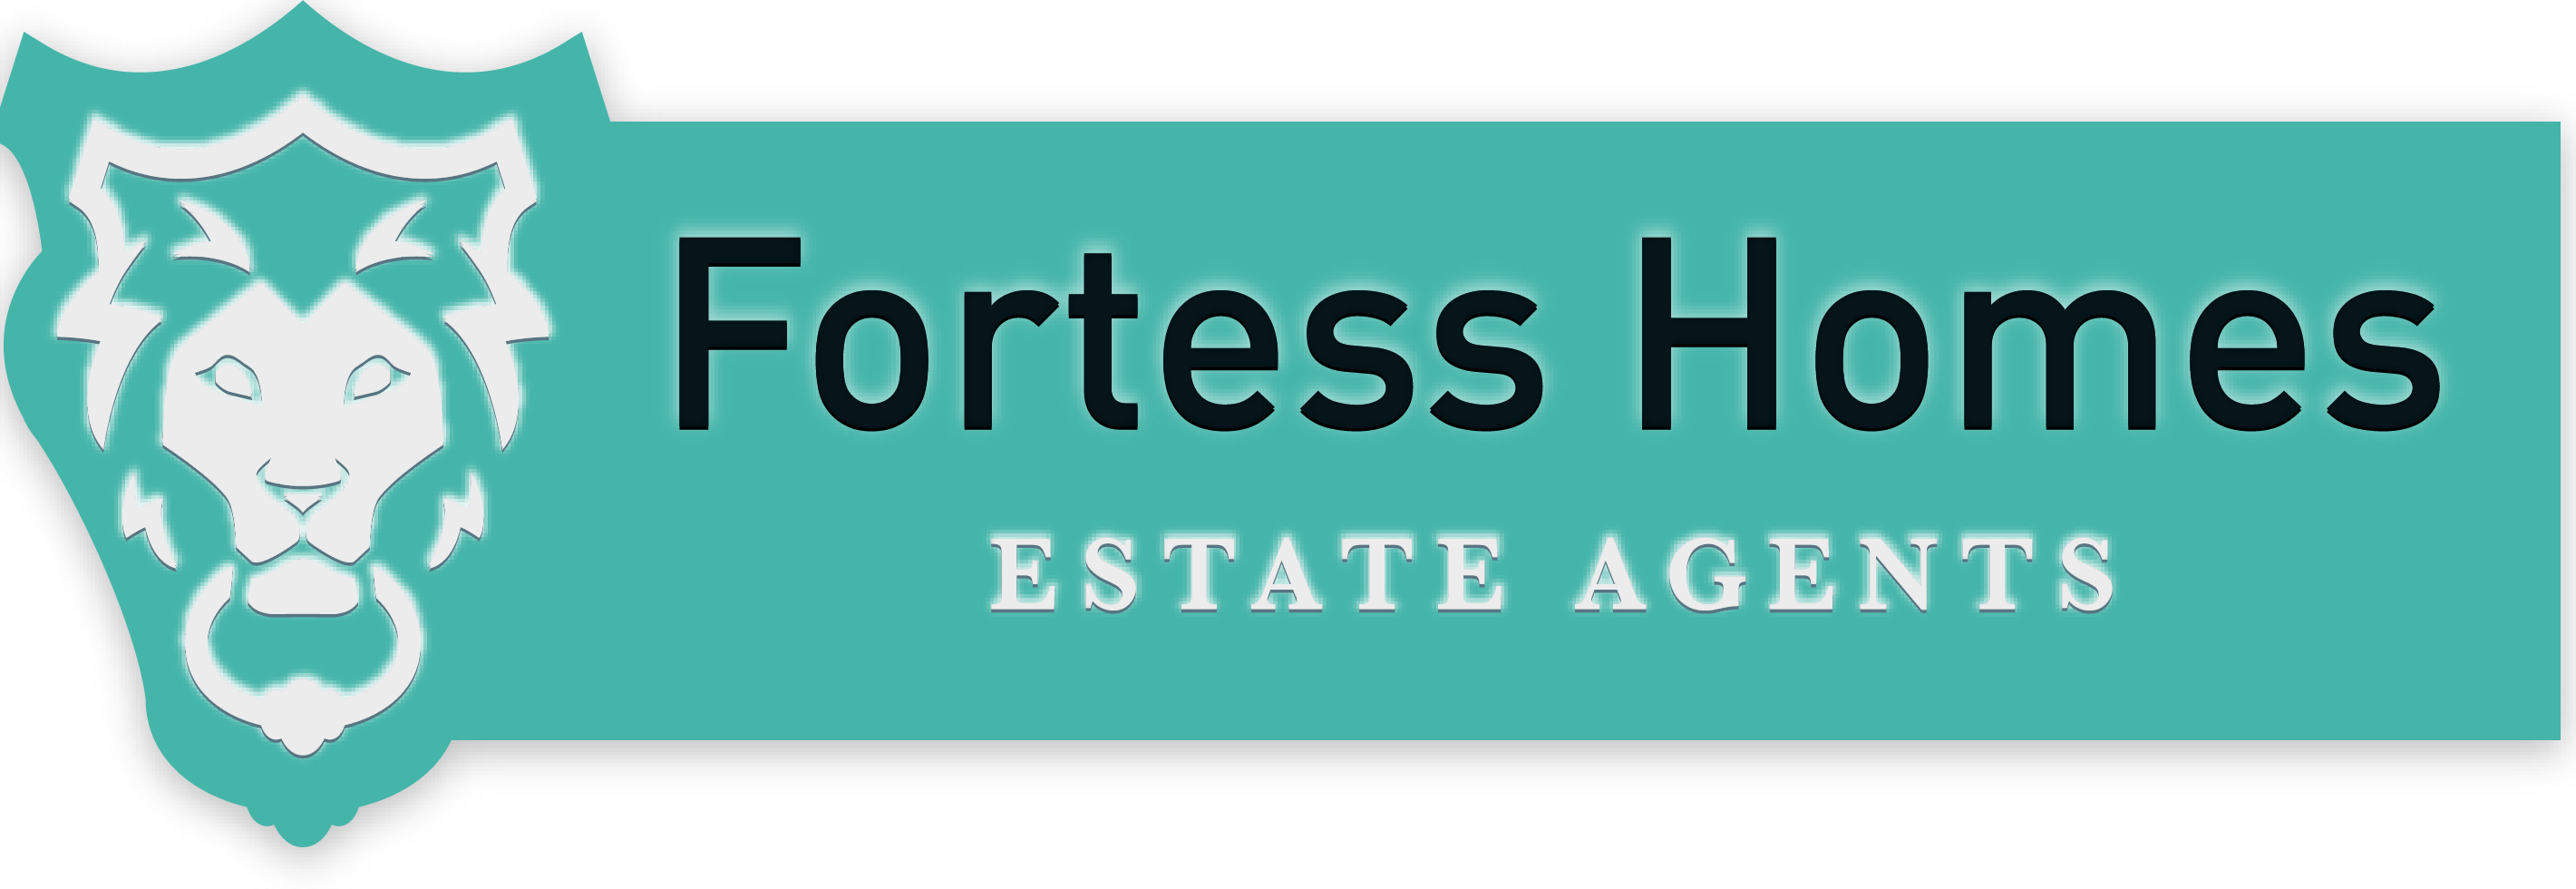 Fortess Homes